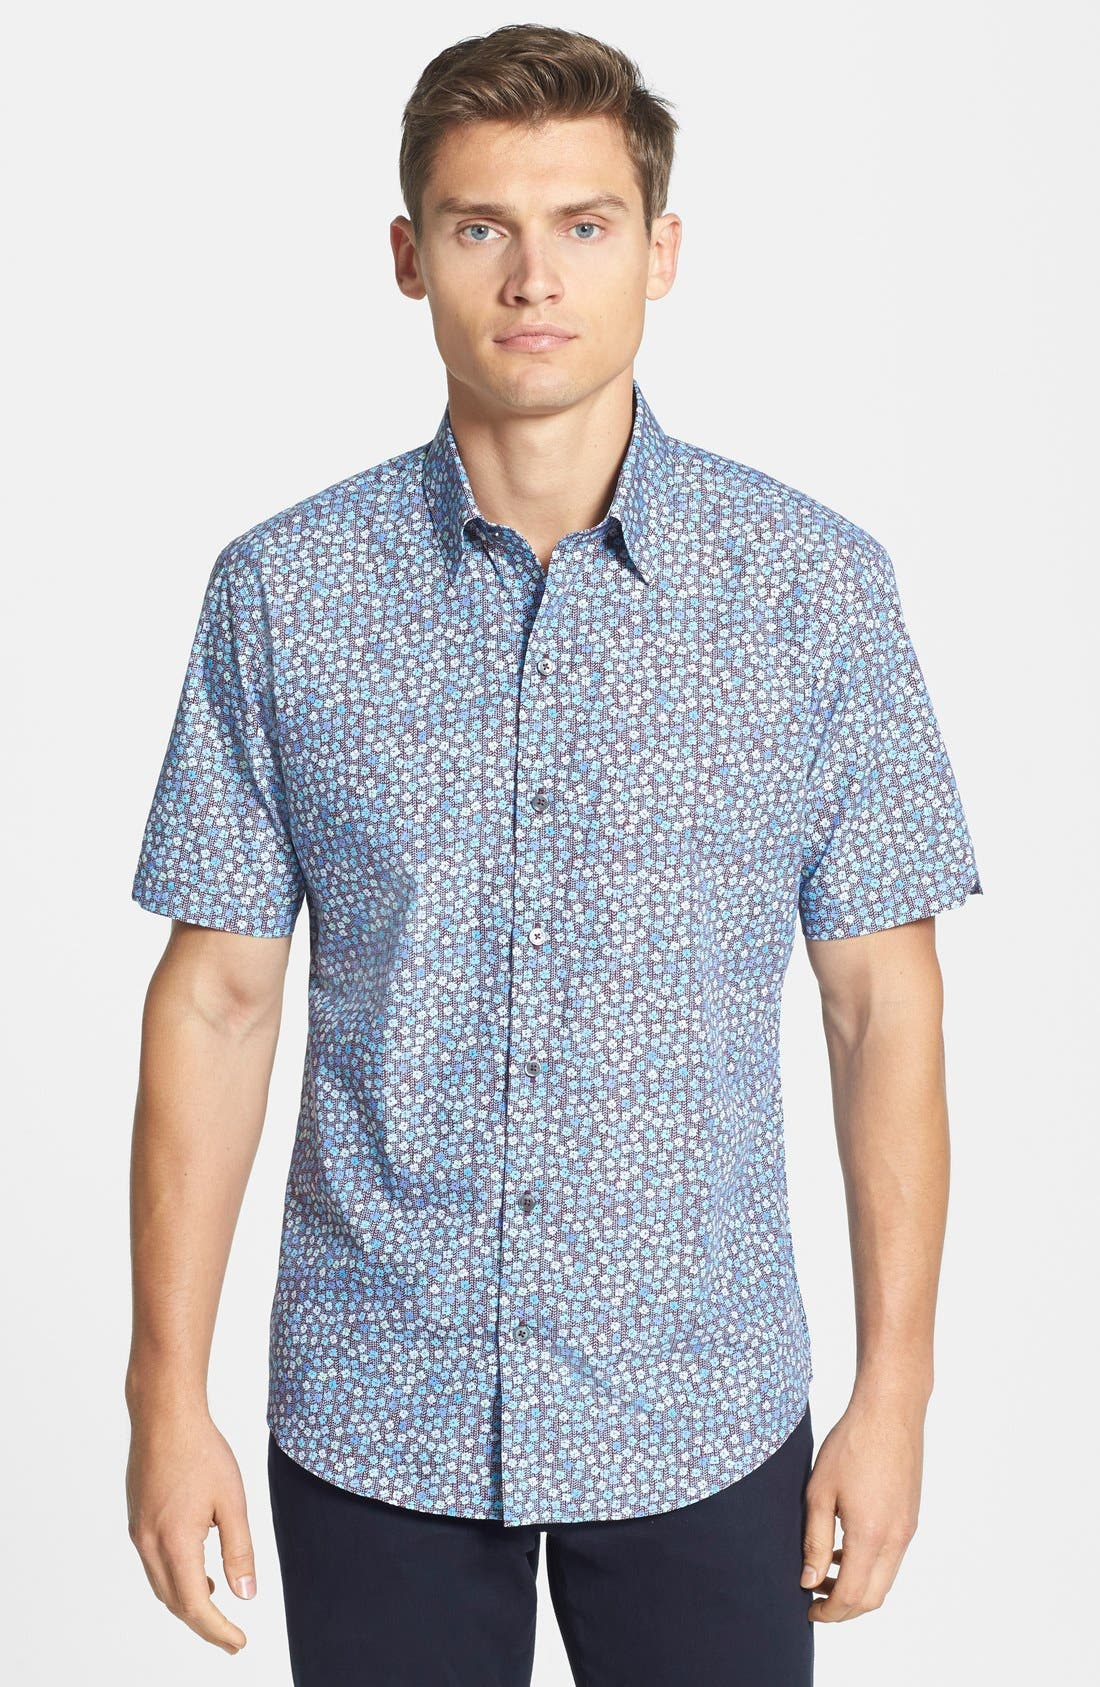 Alternate Image 1 Selected - Zachary Prell 'Roya' Standard Fit Floral Short Sleeve Sport Shirt